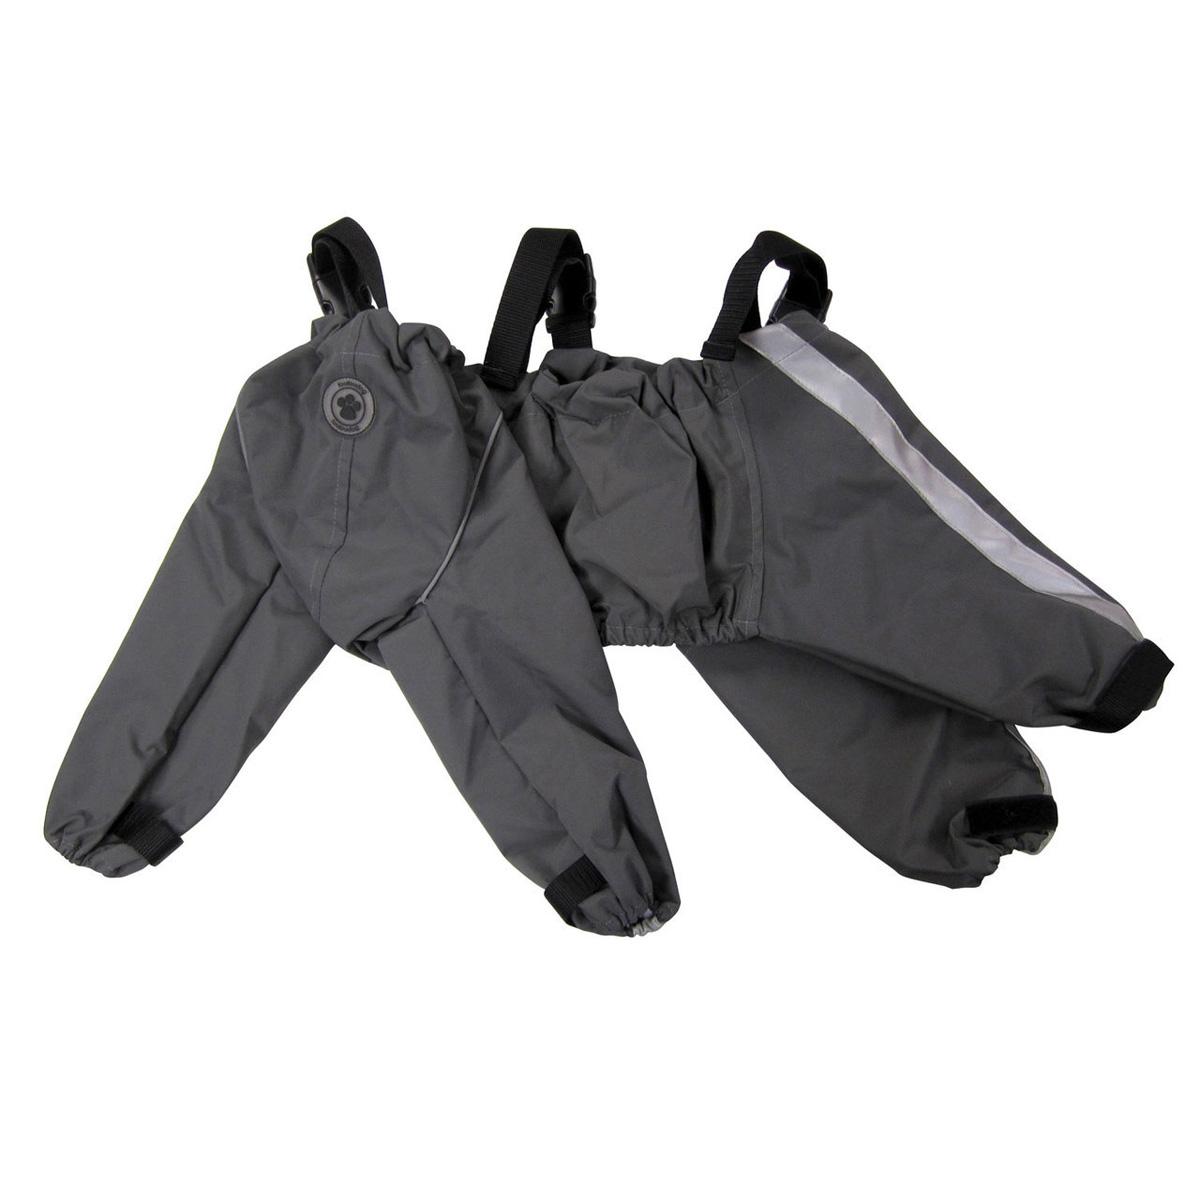 FouFou Dog Bodyguard Dog Pants - Gray